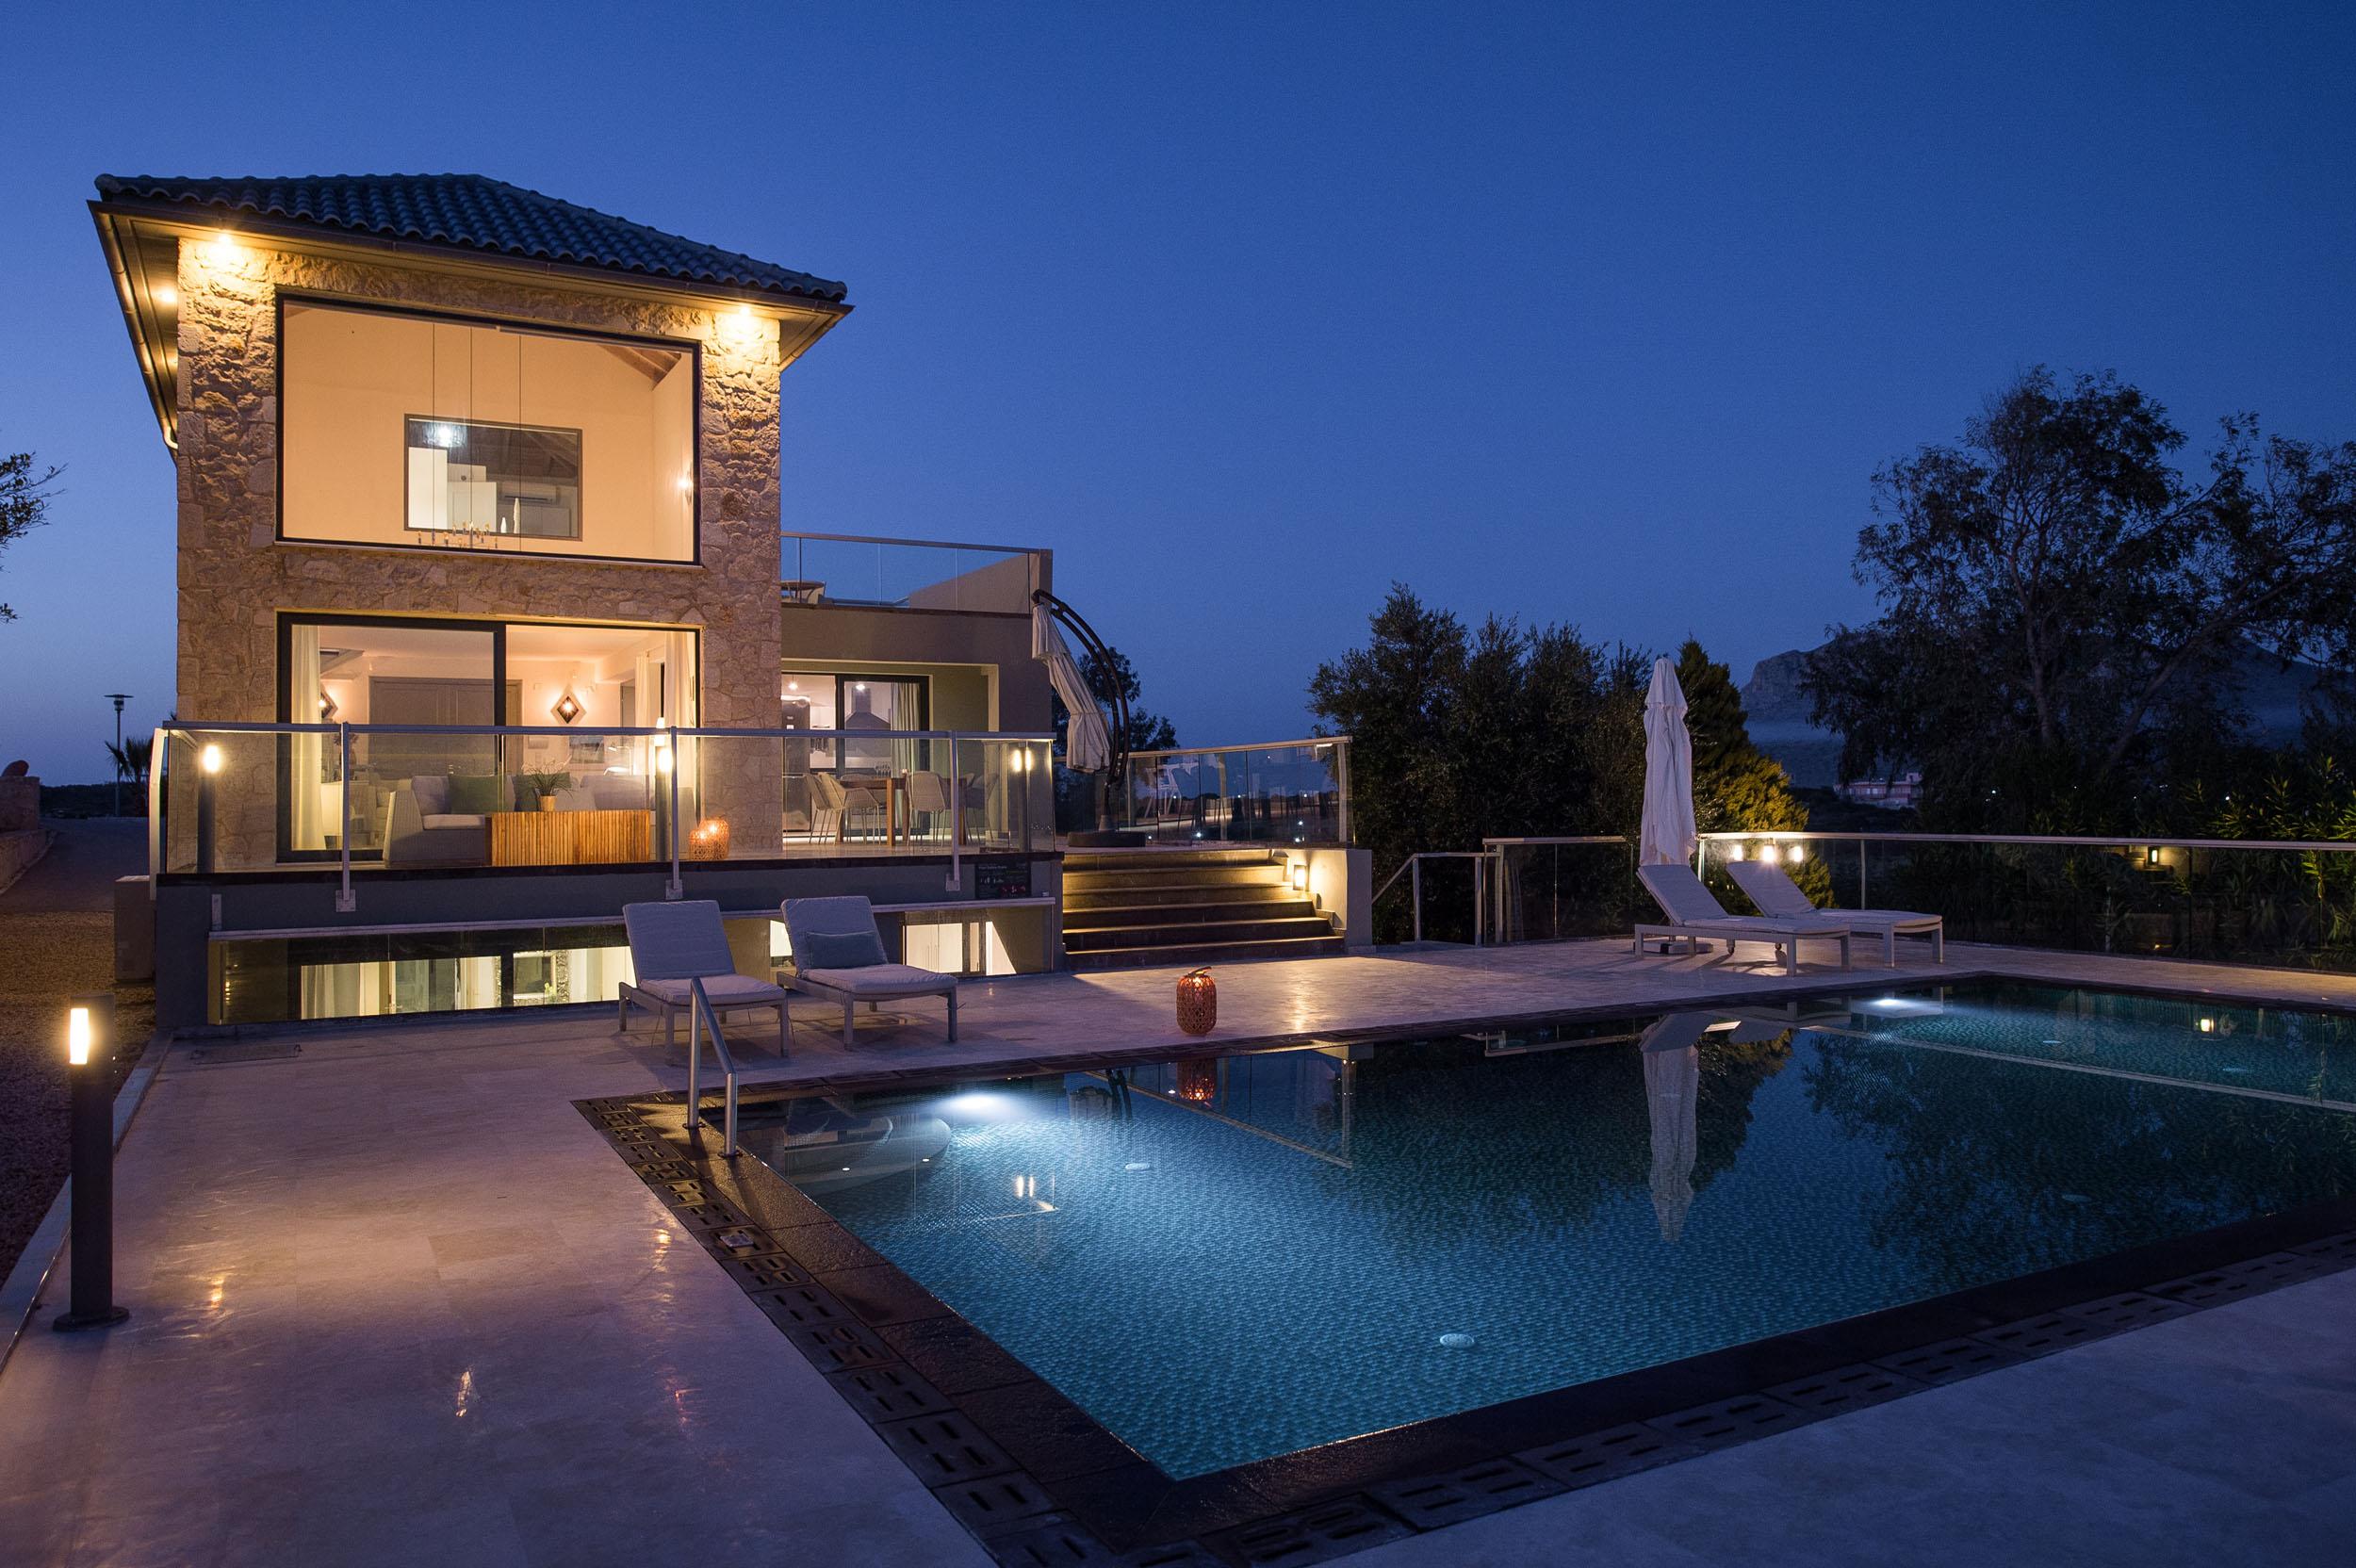 hotel for sale in crete akrotiri by night